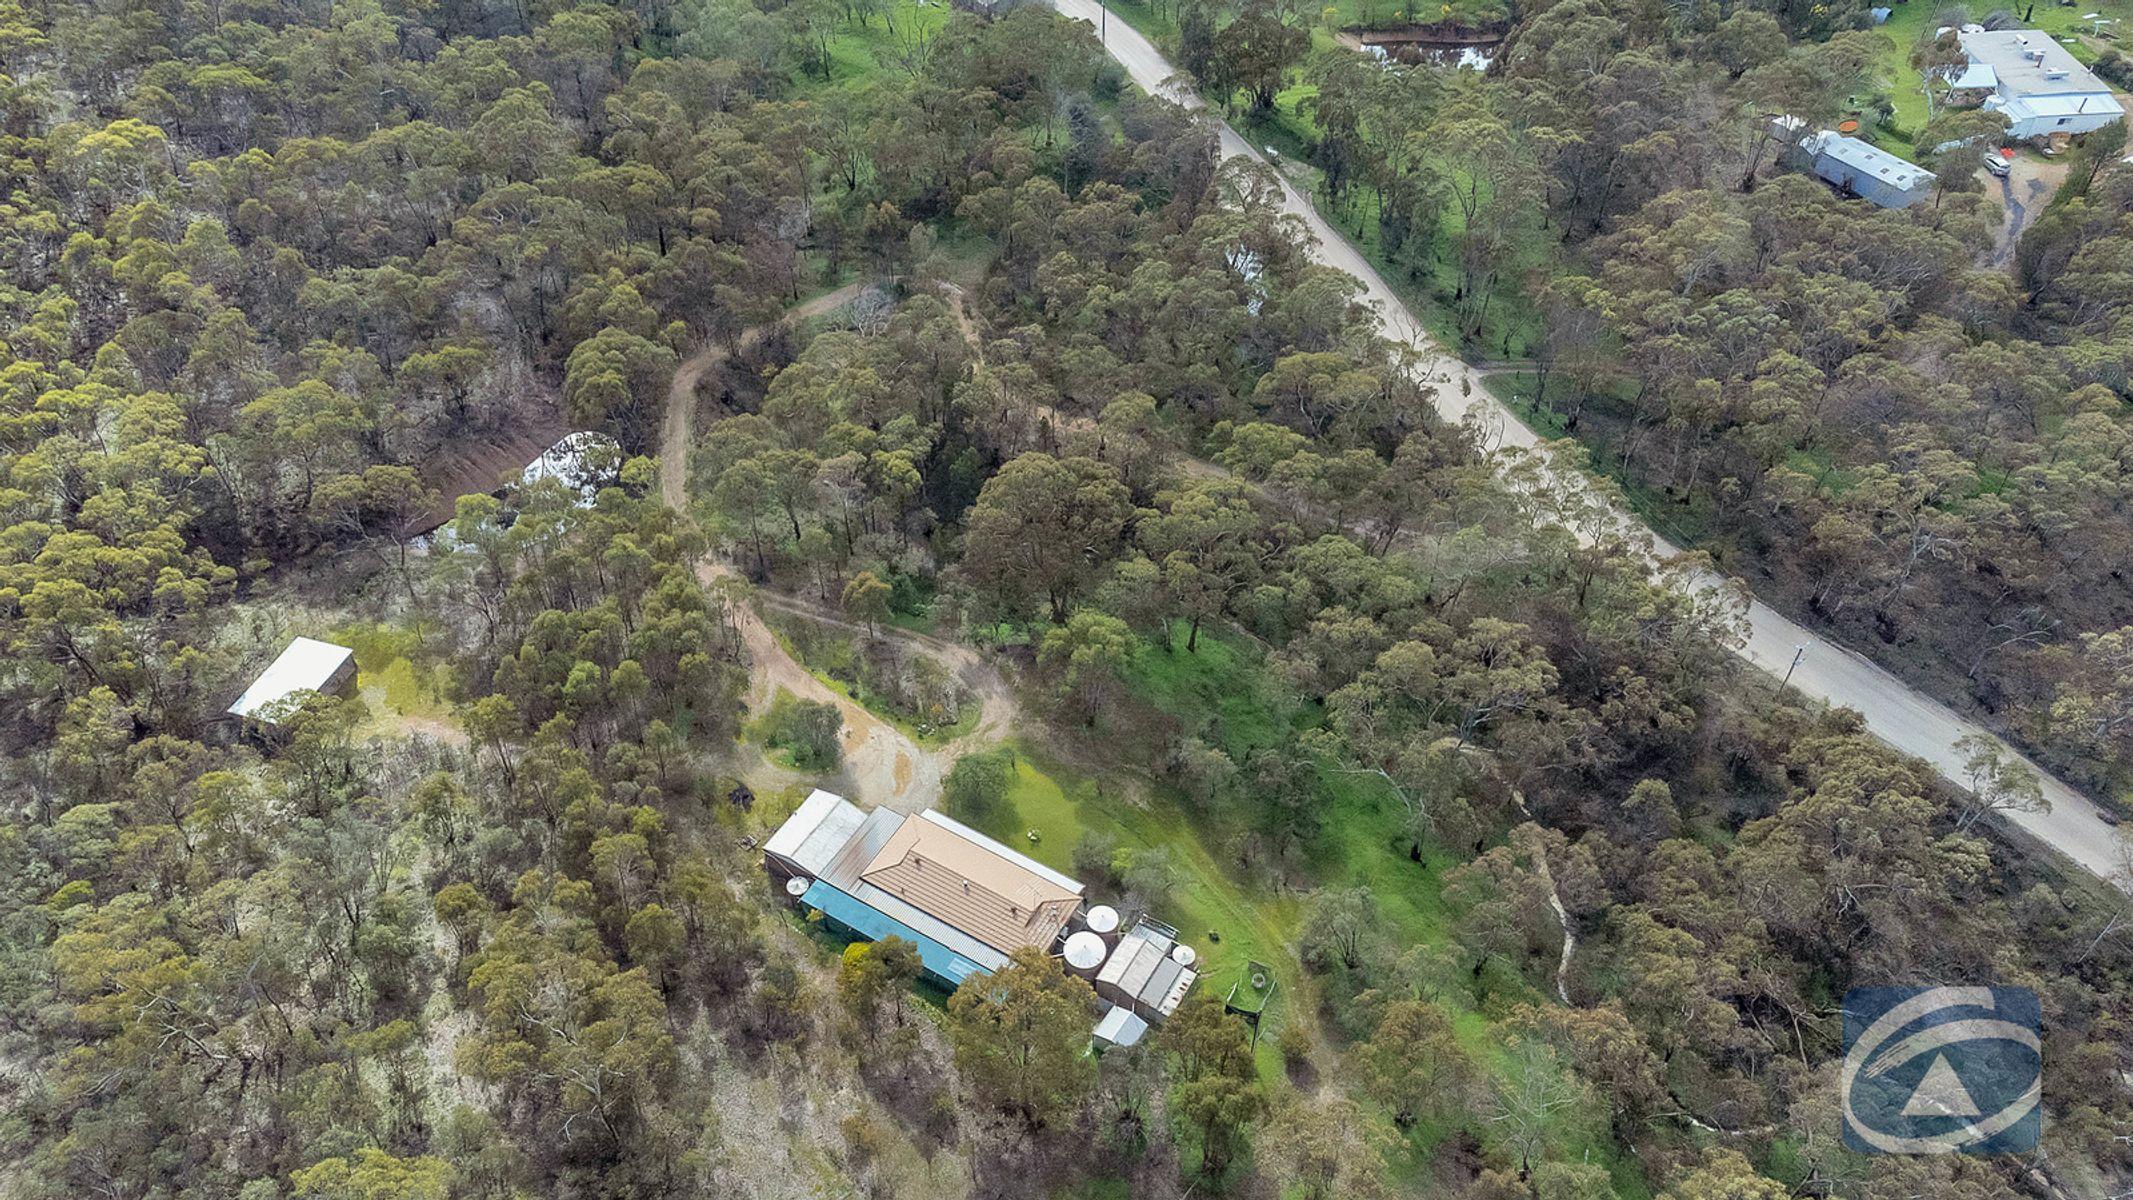 264 Goldfields Road (via Barossa Goldfields), Cockatoo Valley, SA 5351